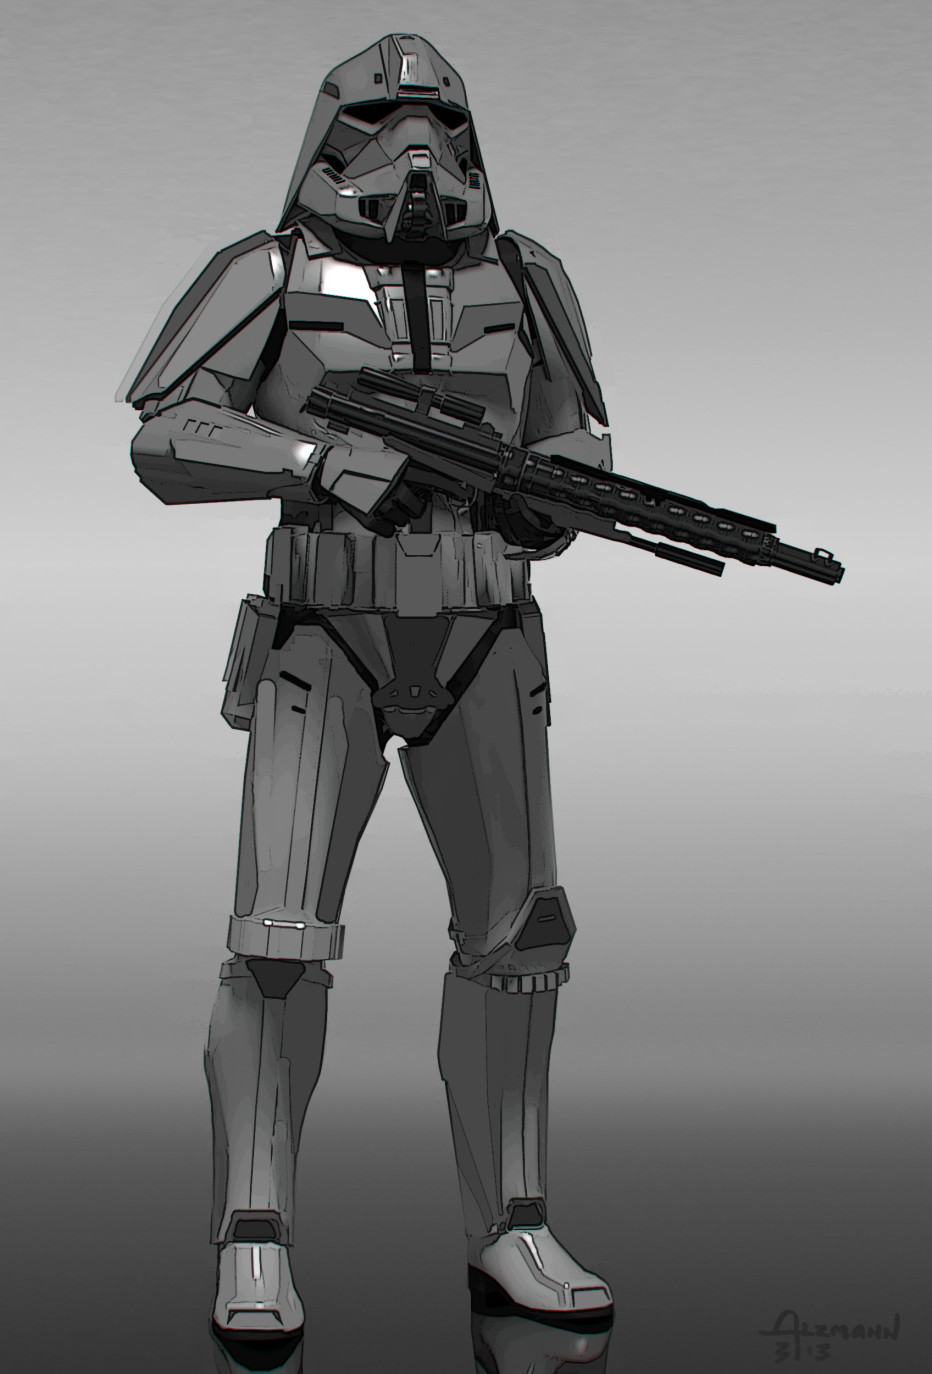 star wars clonetrooper concept - photo #30